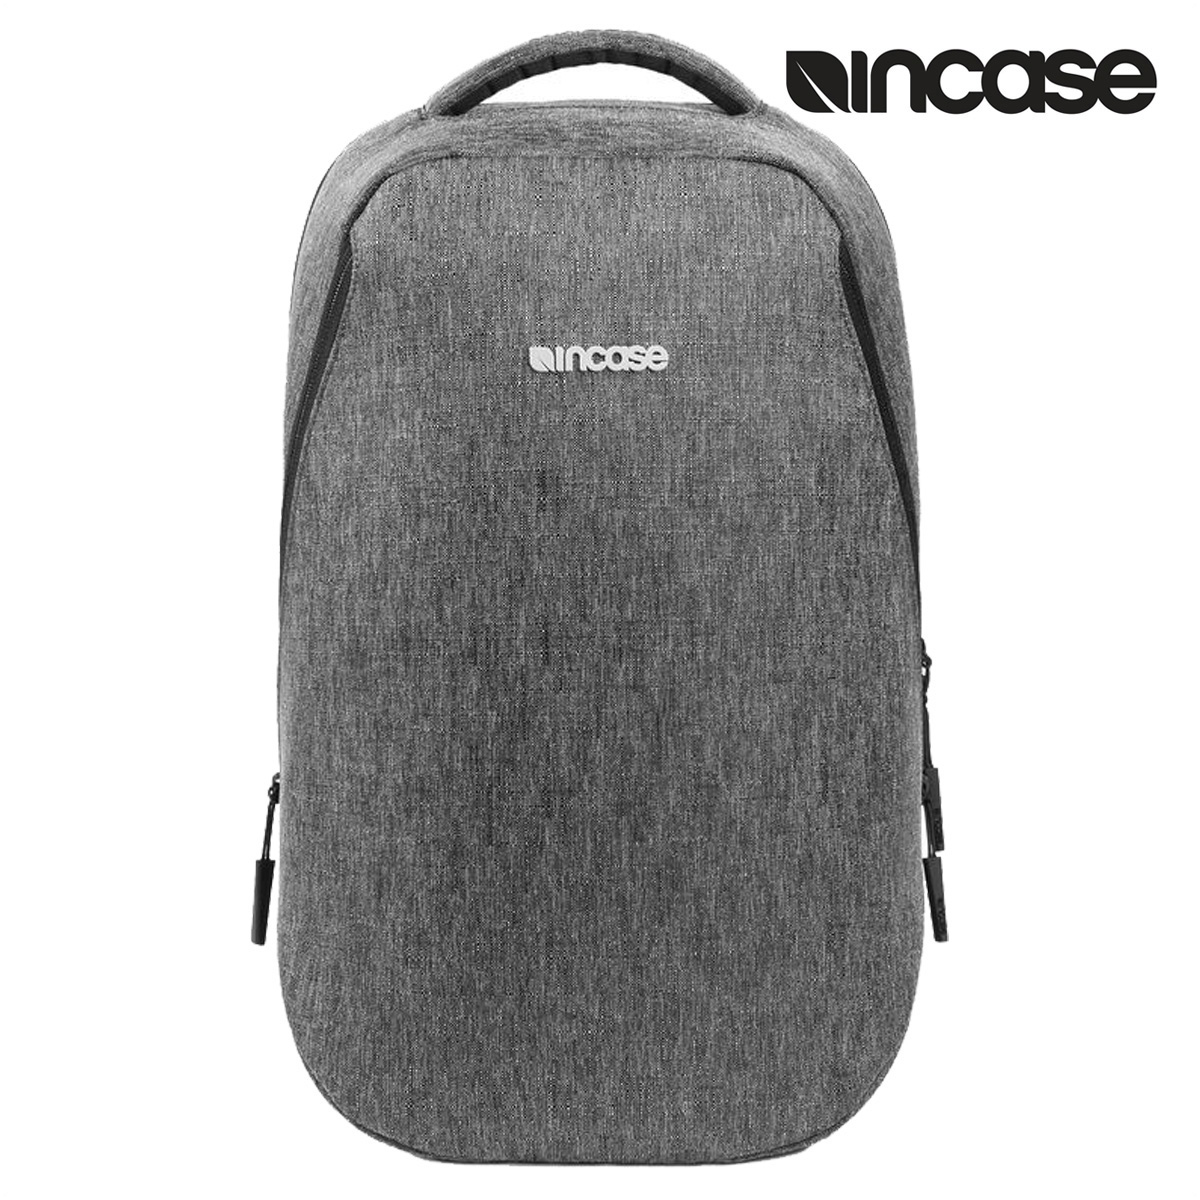 INCASE インケース バックパック リュック 10L REFORM TENSAERLITE BACKPACK CL55574 レディース メンズ ブラック